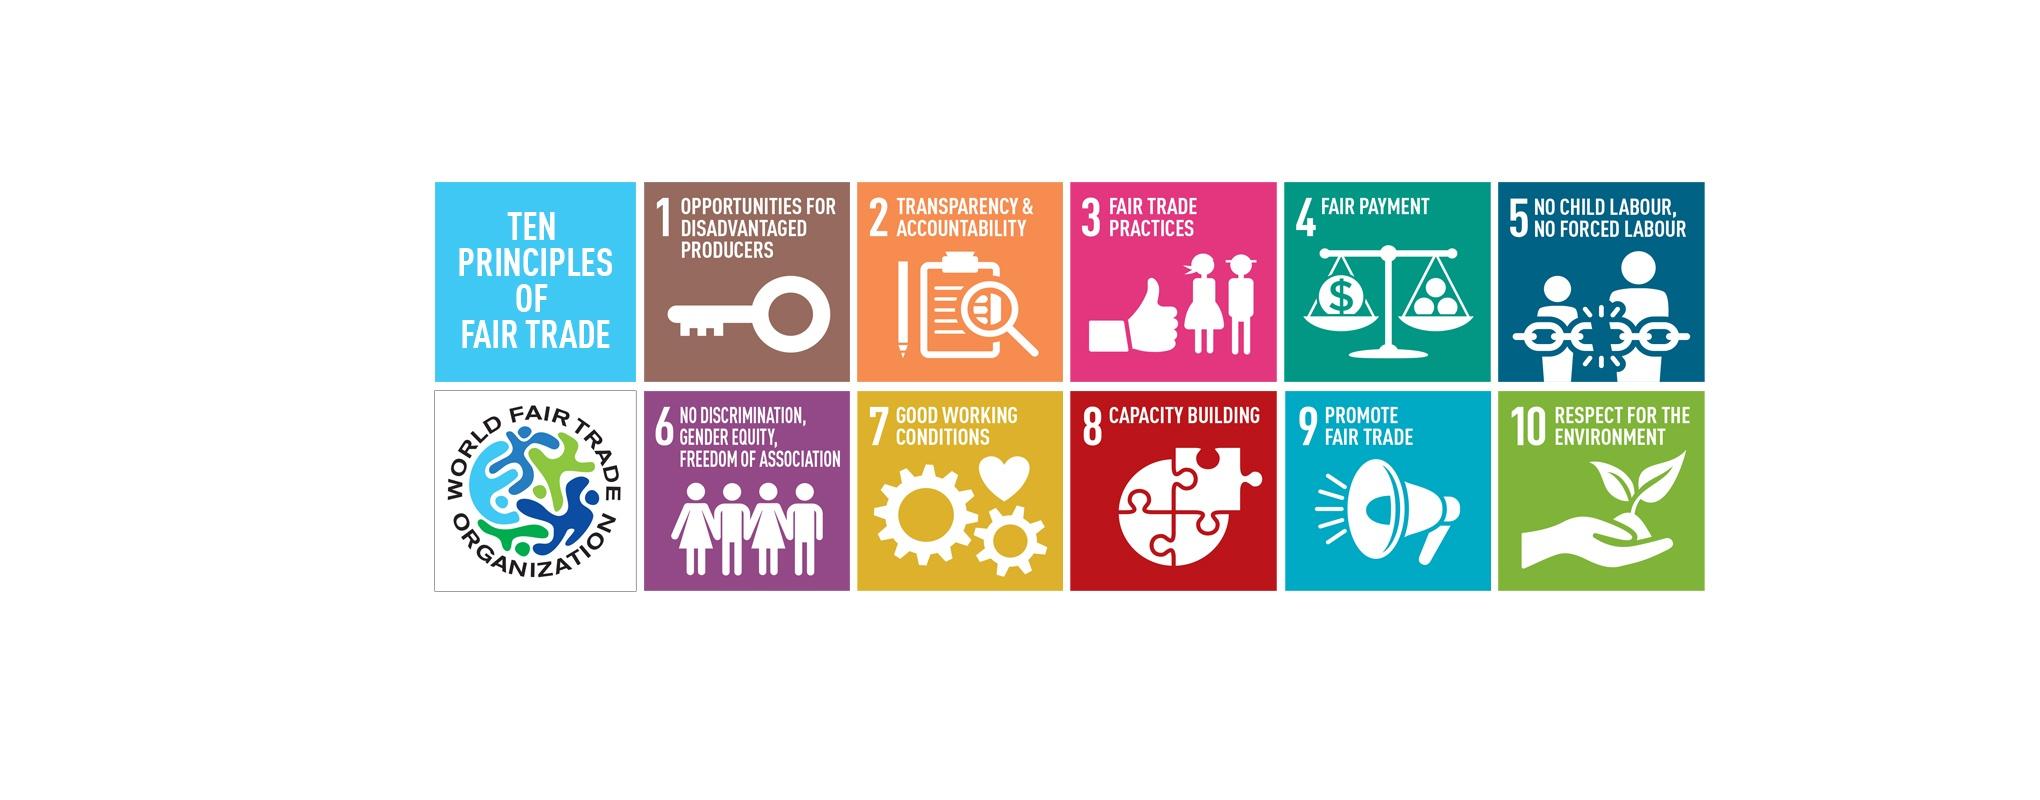 international movement fair trade analysis